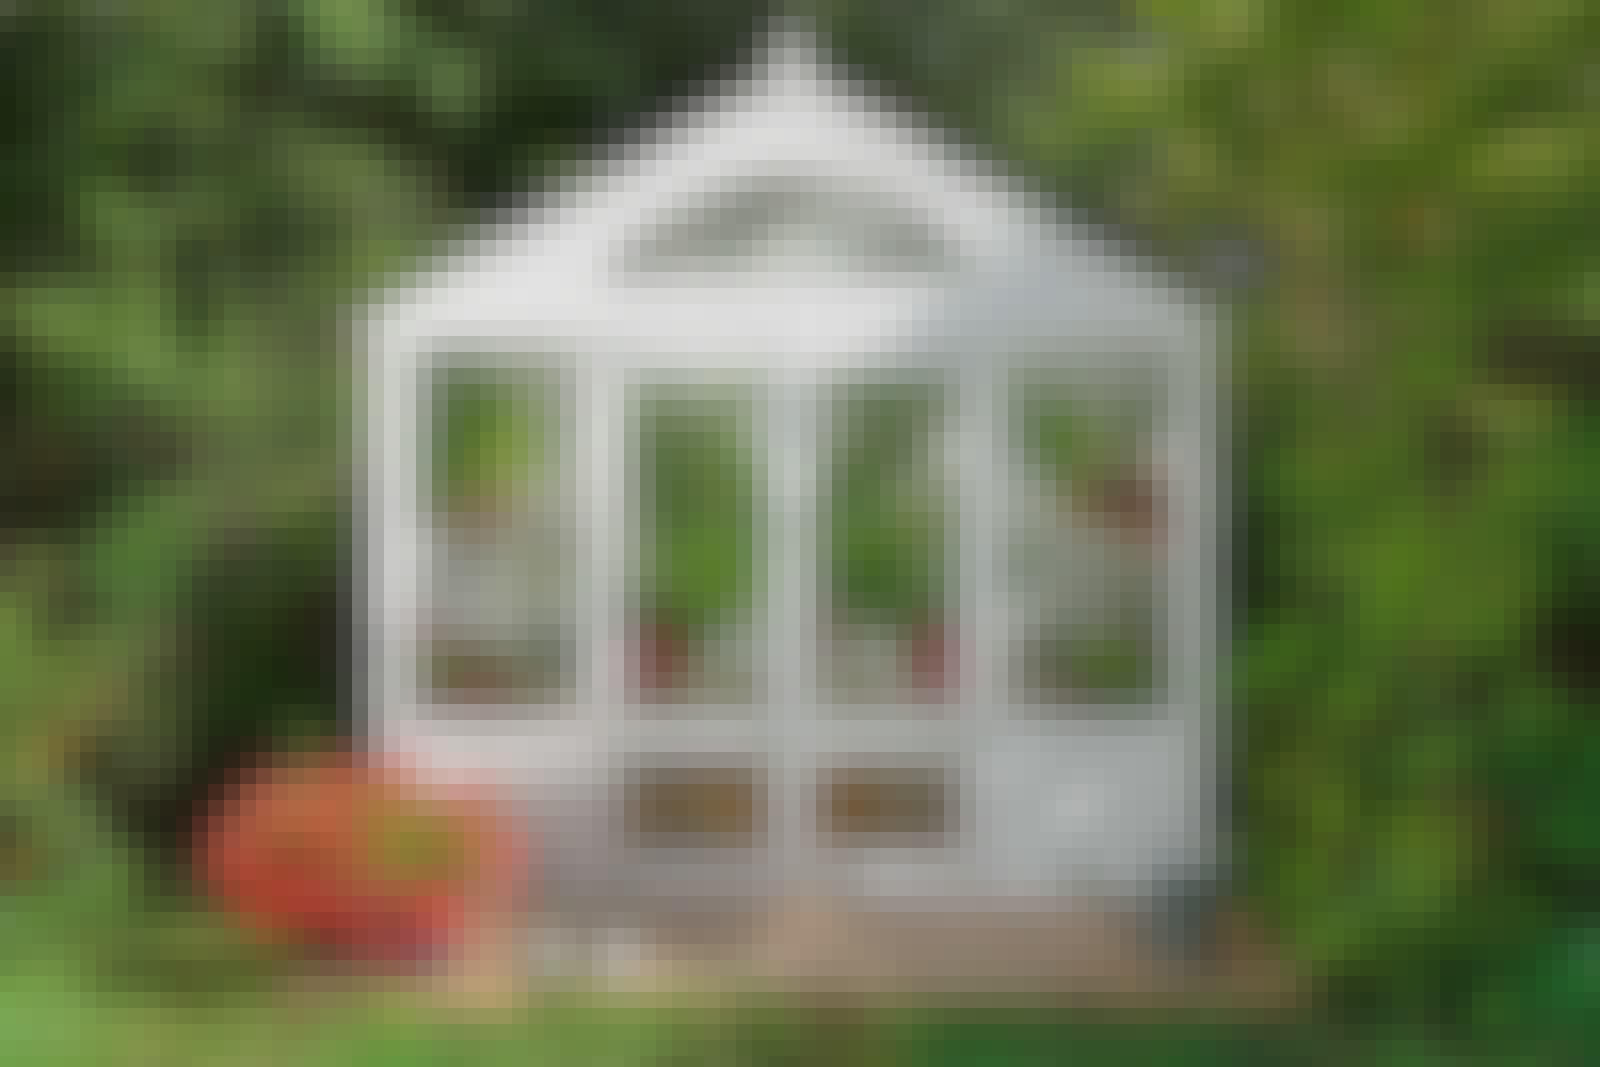 Stolpesko til lysthuse og haveskure